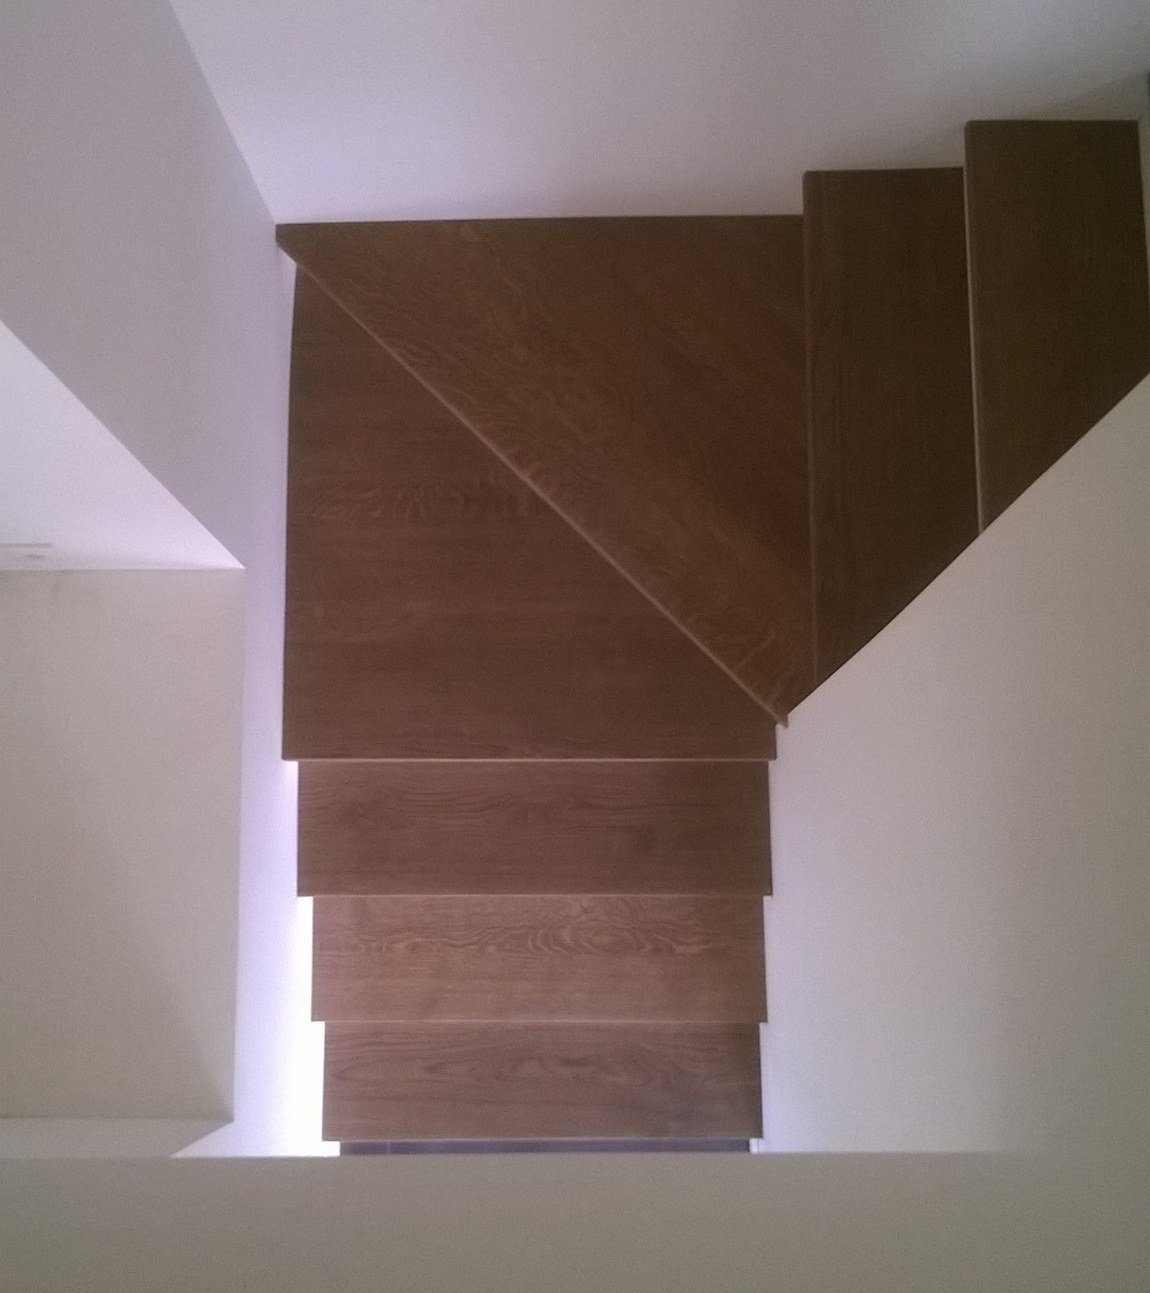 Habillage bois escalier béton